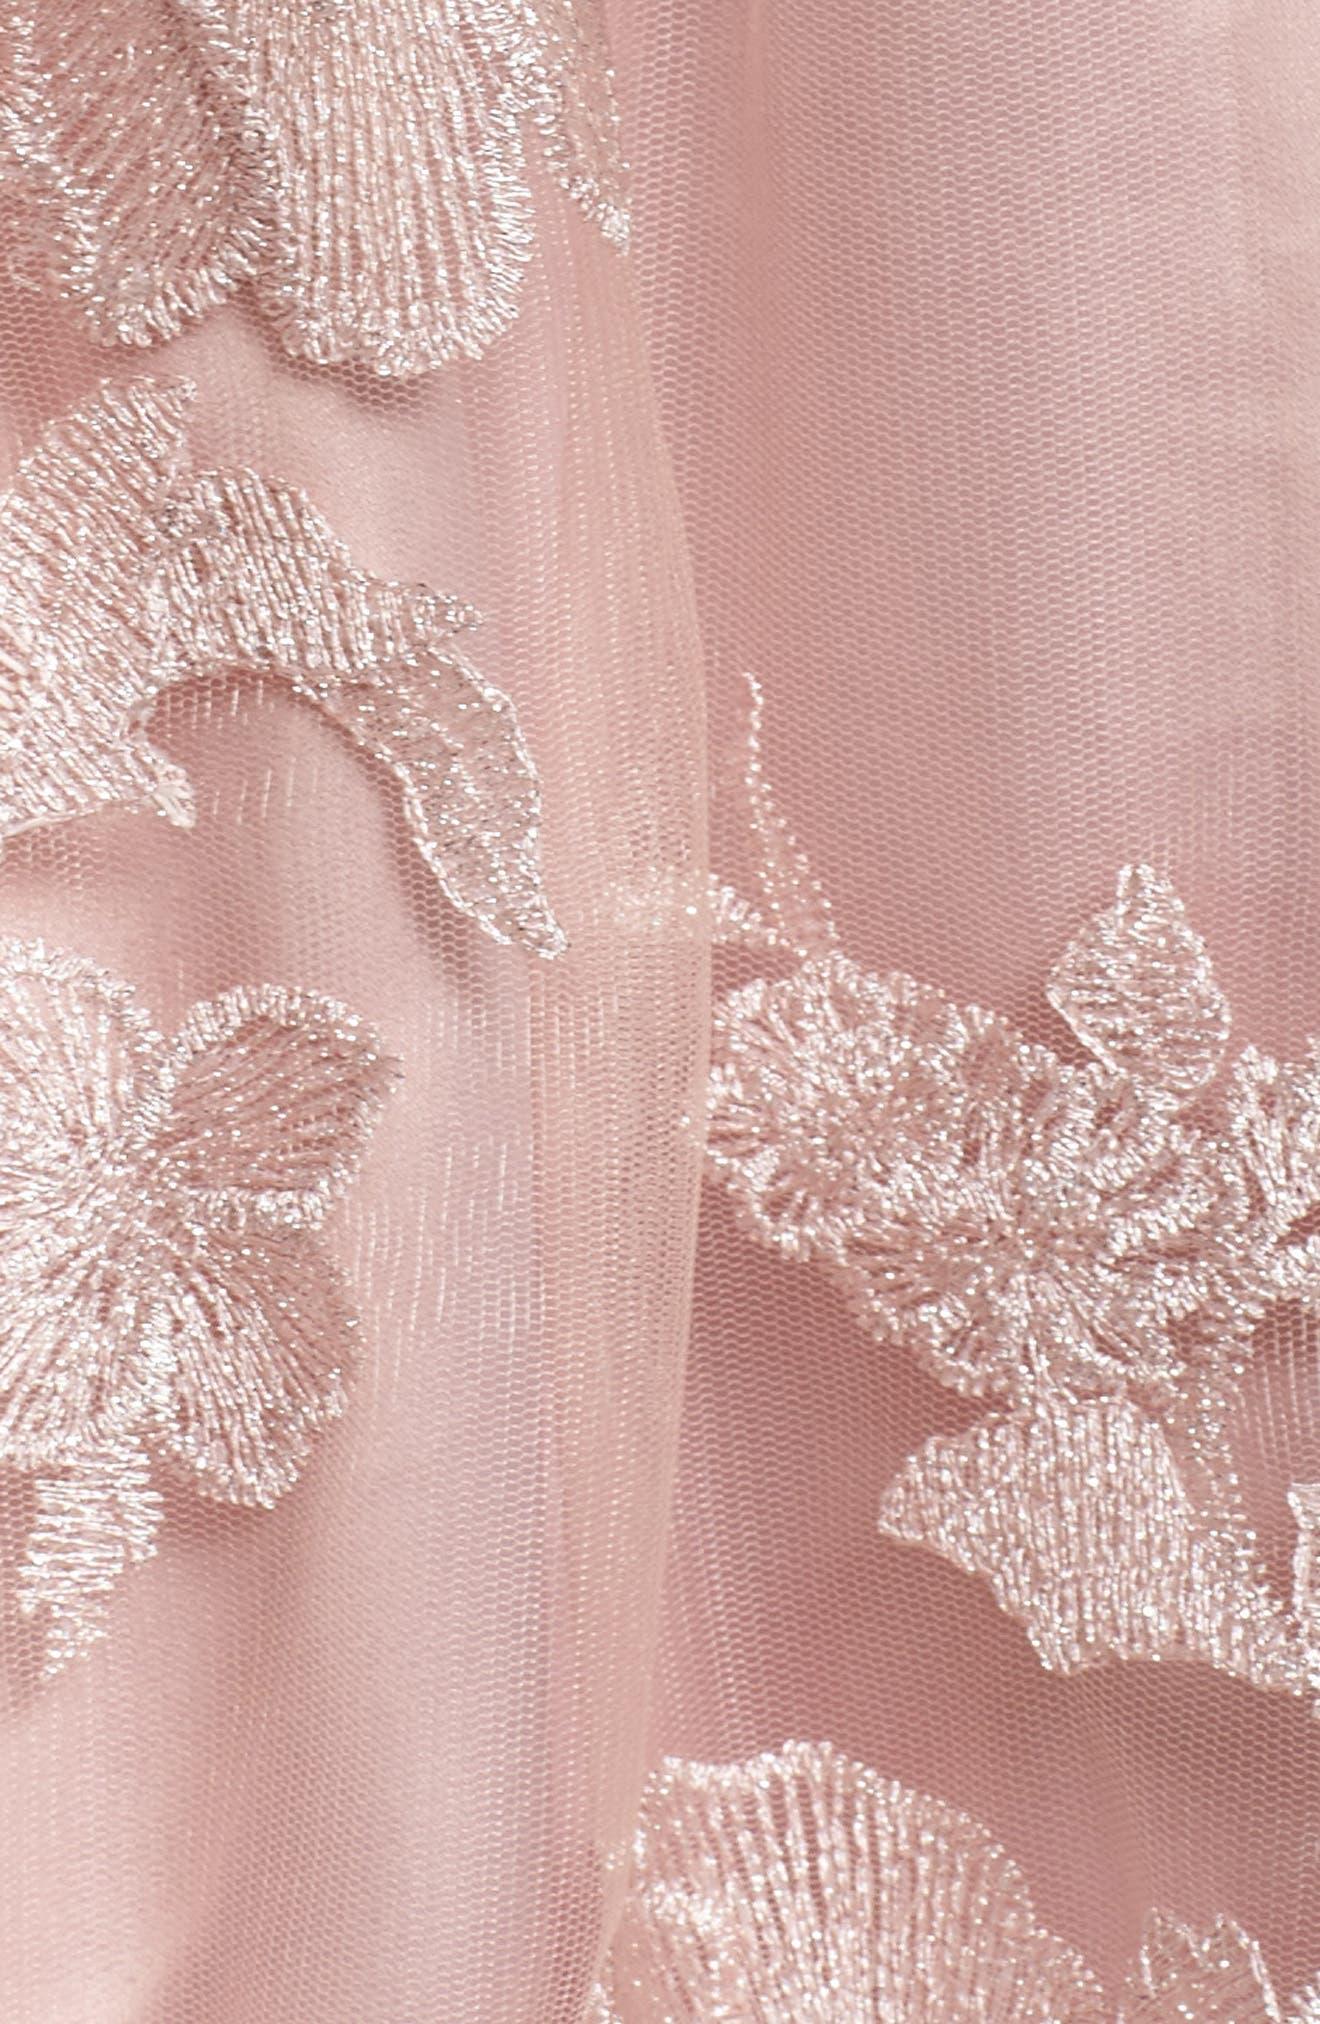 Floral Embroidered Skirt,                             Alternate thumbnail 5, color,                             Blush